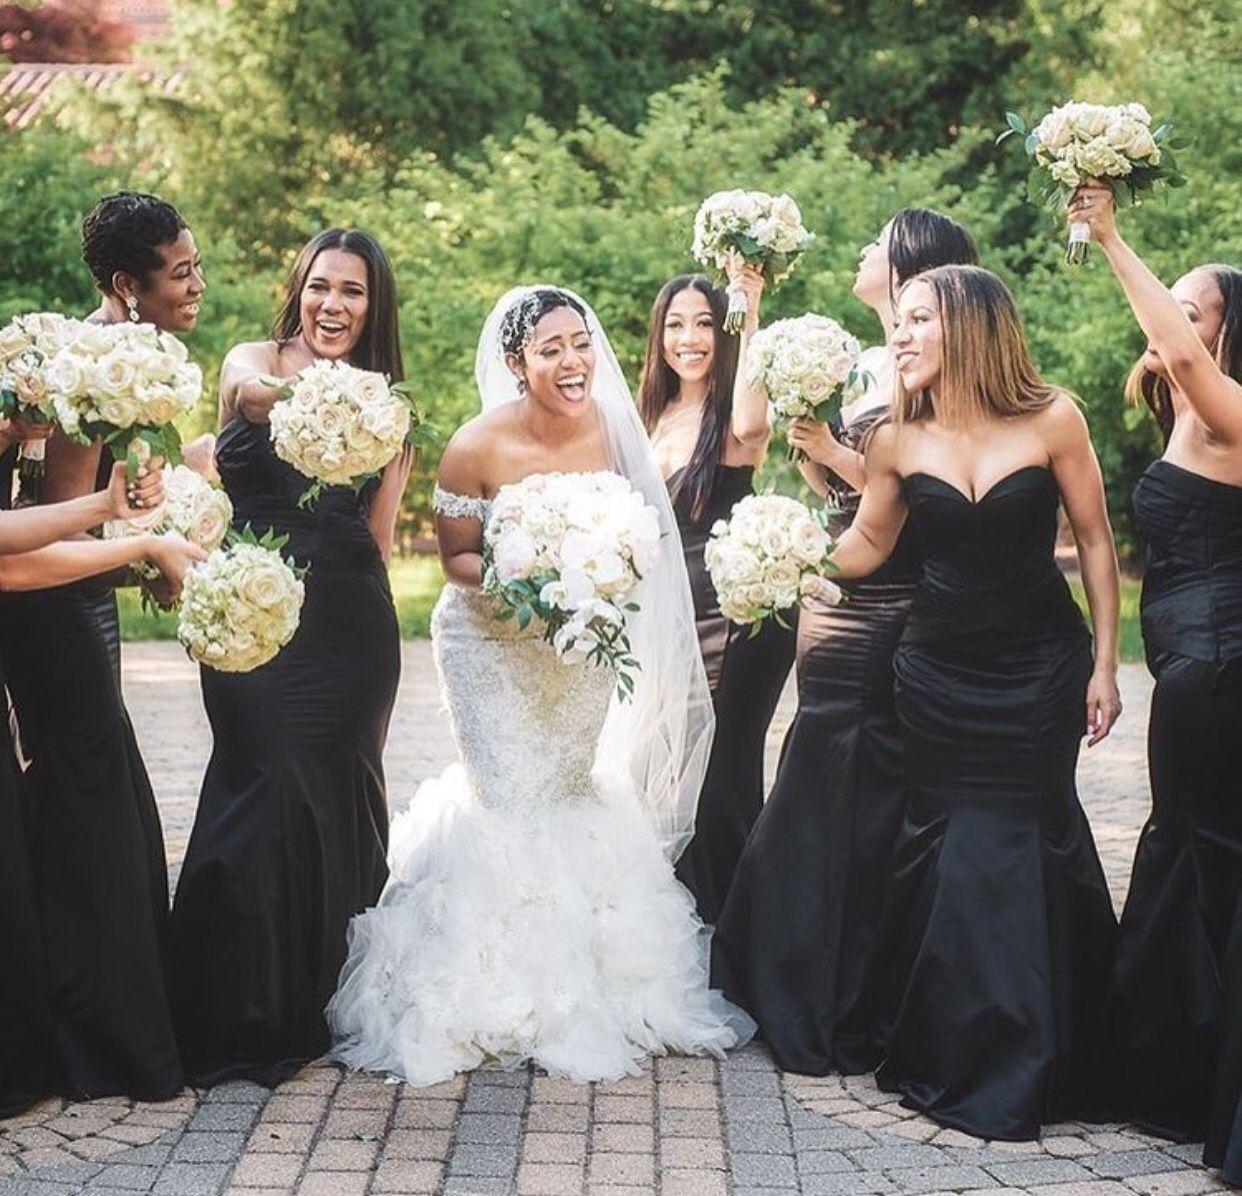 Wedding dresses for black girls  Pin by Michelle Jackson on Wedding Inspiration  Pinterest  Black